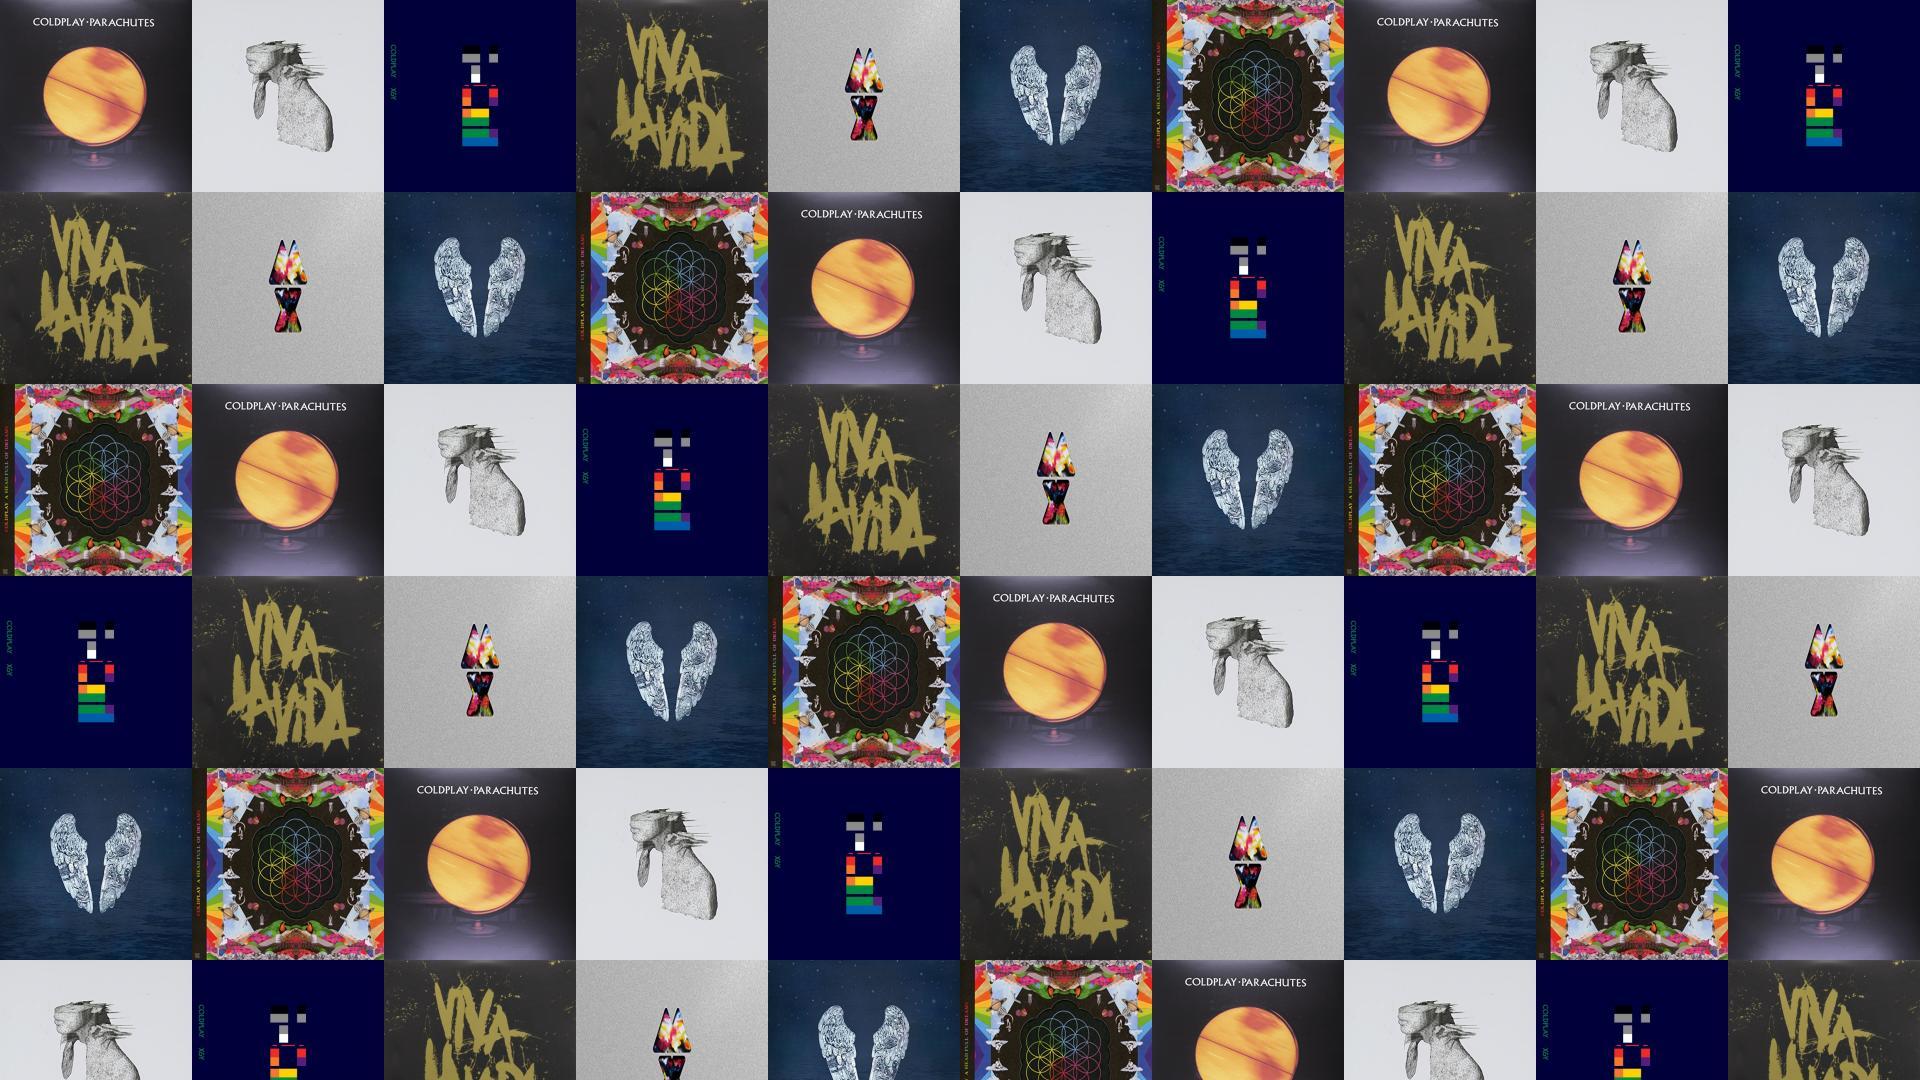 Coldplay Parachutes A Rush Blood To Head X Wallpaper « Tiled Desktop